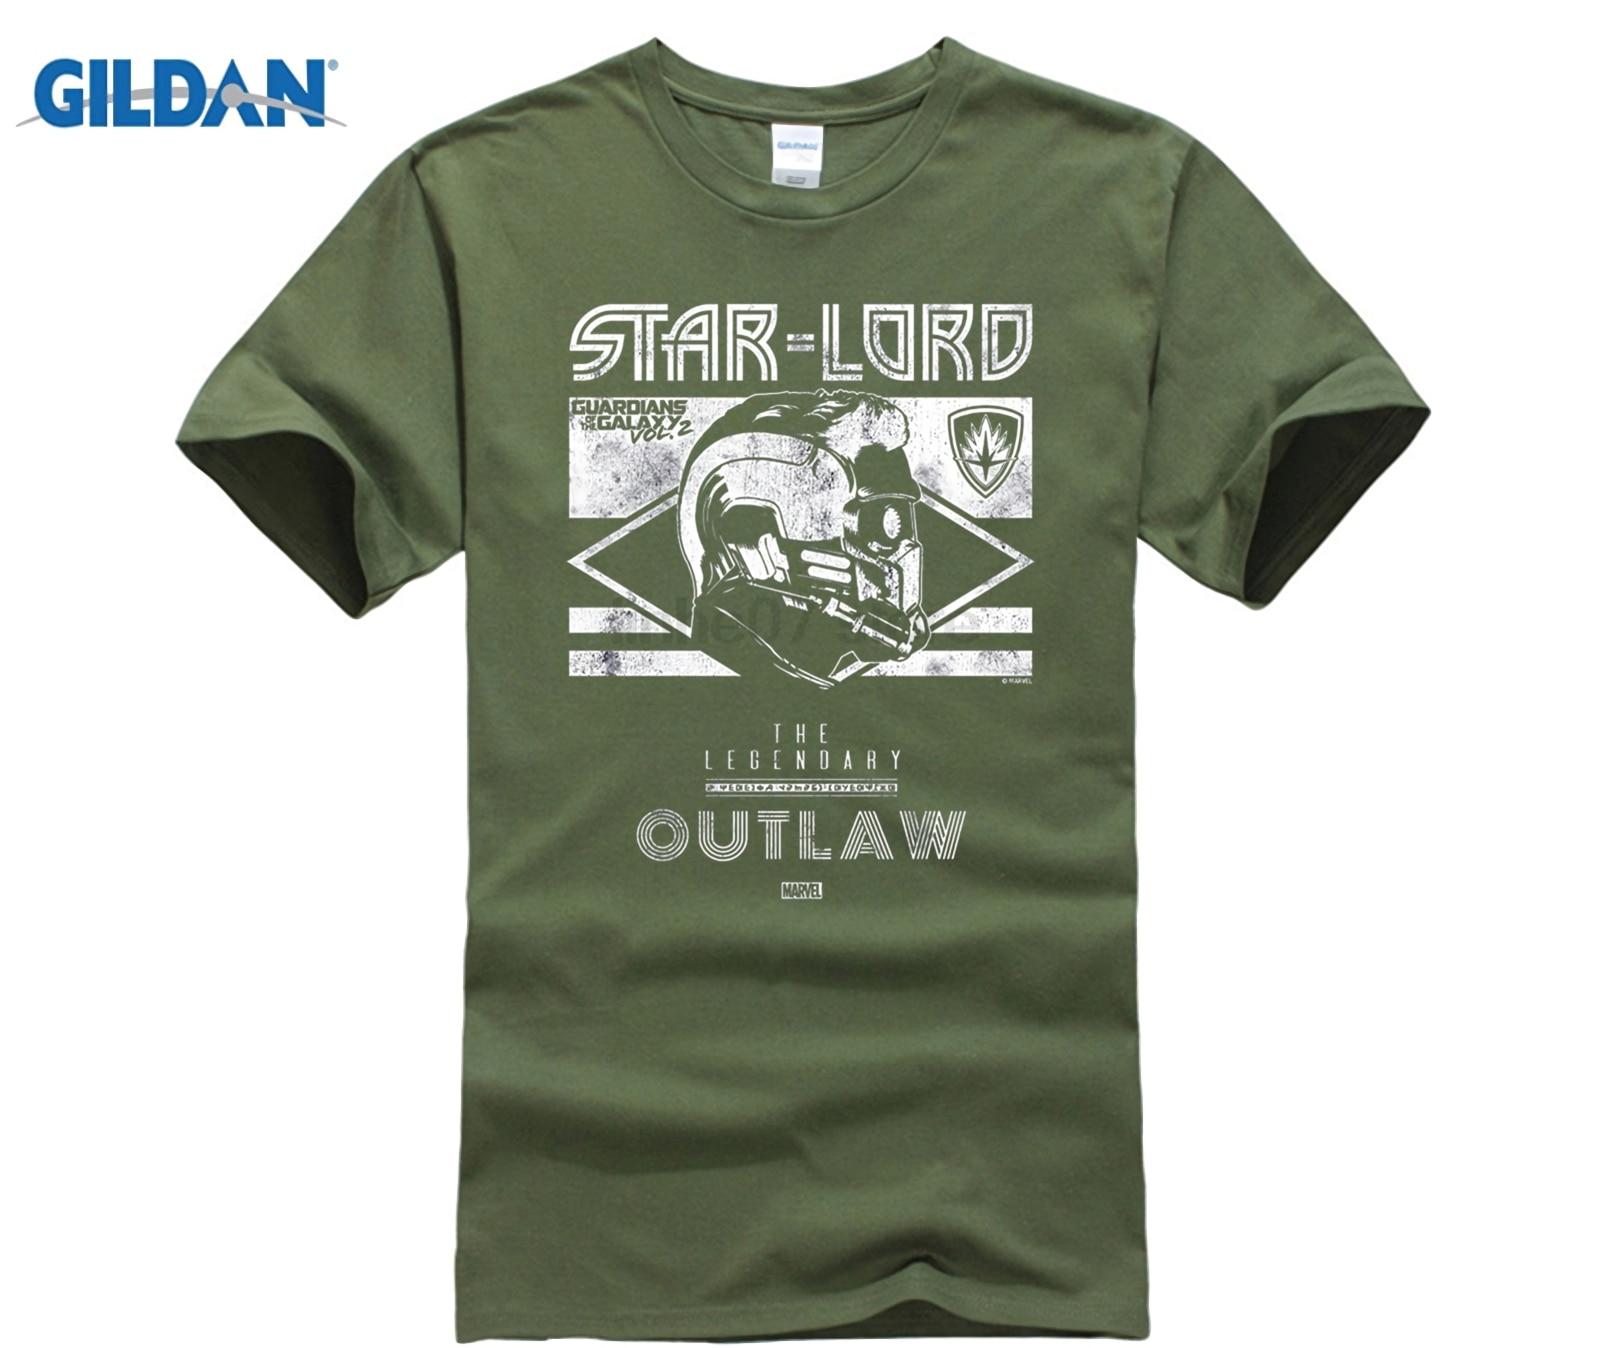 GILDAN Star-Lord Guardians of Galaxy 2 Legend Graphic Shirt Dress female T-shirt